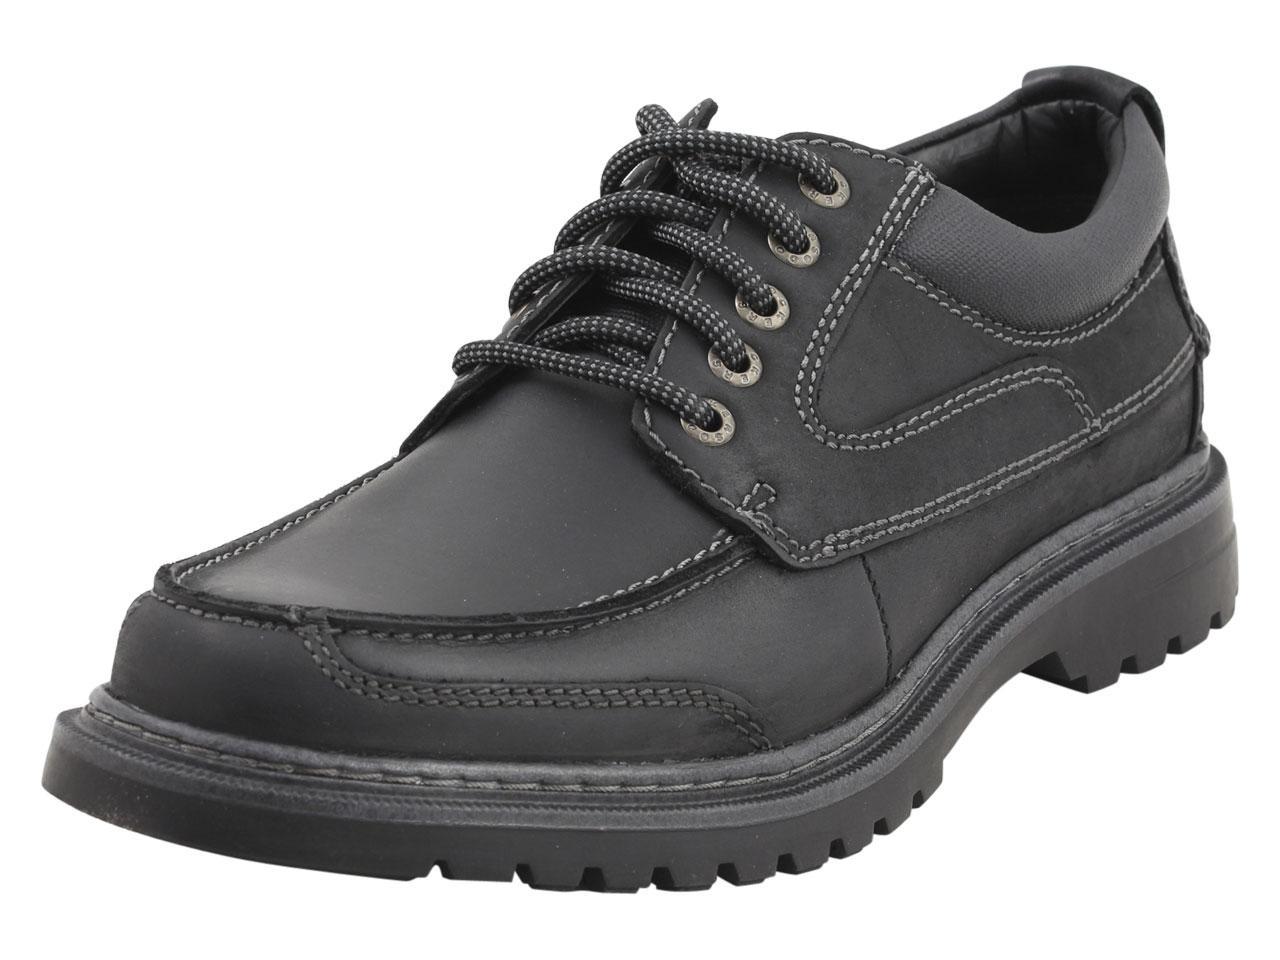 Image of Dockers Men's Overton Water Repellent Oxfords Shoes - Black - 12 D(M) US